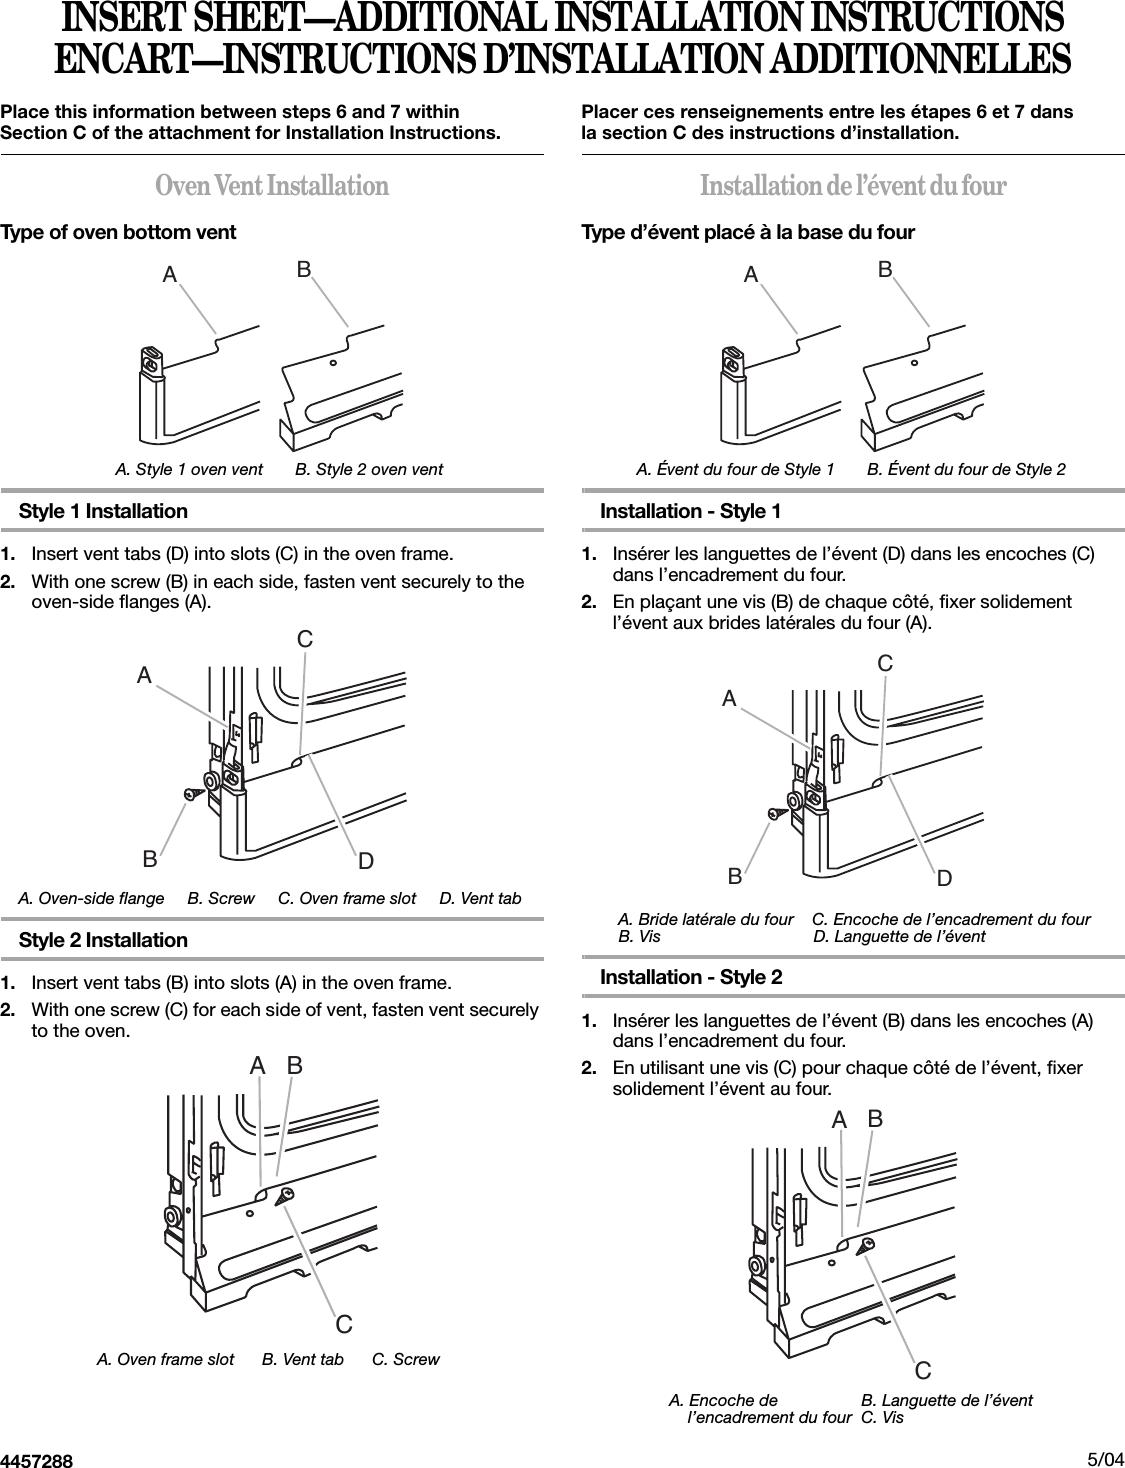 INSERT SHEET—ADDITIONAL INSTALLATION INSTRUCTIONSENCART—INSTRUCTIONS D'INSTALLATION ADDITIONNELLESPlace this information between steps 6 and 7 within Section C of the attachment for Installation Instructions.Oven Vent InstallationType of oven bottom vent                         A. Style 1 oven vent       B. Style 2 oven ventStyle 1 Installation1. Insert vent tabs (D) into slots (C) in the oven frame.2. With one screw (B) in each side, fasten vent securely to the oven-side flanges (A).    A. Oven-side flange     B. Screw     C. Oven frame slot     D. Vent tabStyle 2 Installation1. Insert vent tabs (B) into slots (A) in the oven frame.2. With one screw (C) for each side of vent, fasten vent securely to the oven.                     A. Oven frame slot      B. Vent tab      C. Screw4457288Placer ces renseignements entre les étapes 6 et 7 dans la section C des instructions d'installation.Installation de l'évent du fourType d'évent placé à la base du four            A. Évent du four de Style 1       B. Évent du four de Style 2Installation - Style 1 1. Insérer les languettes de l'évent (D) dans les encoches (C) dans l'encadrement du four.2. En plaçant une vis (B) de chaque côté, fixer solidement l'évent aux brides latérales du four (A).        A. Bride latérale du four    C. Encoche de l'encadrement du four    B. Vis                                 D. Languette de l'éventInstallation - Style 2 1. Insérer les languettes de l'évent (B) dans les encoches (A) dans l'encadrement du four.2. En utilisant une vis (C) pour chaque côté de l'évent, fixer solidement l'évent au four.                   A. Encoche de                  B. Languette de l'évent                   l'encadrement du four  C. Vis                                                                                                            5/04ABABCDABCABABCDABC